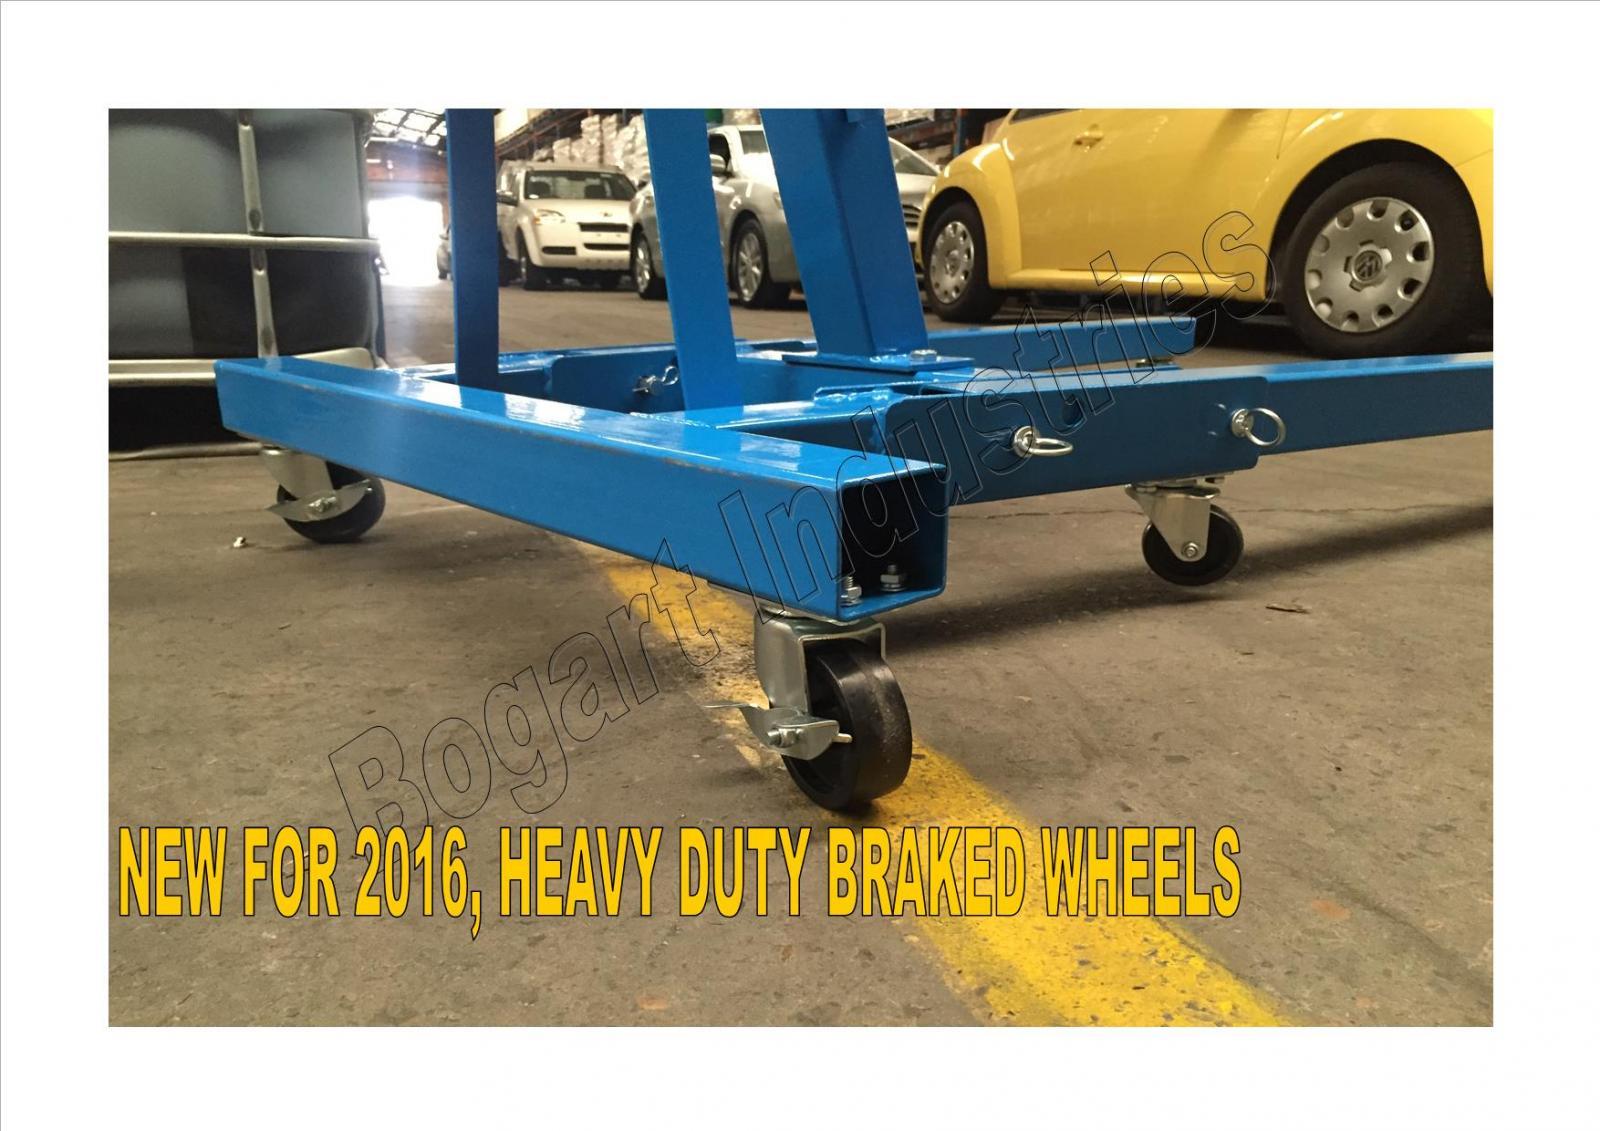 +Engine Hoist Lifter, Folding Shop Crane, 2Ton Quality, BONUS 1.8T LOAD LEVELLER | eBay